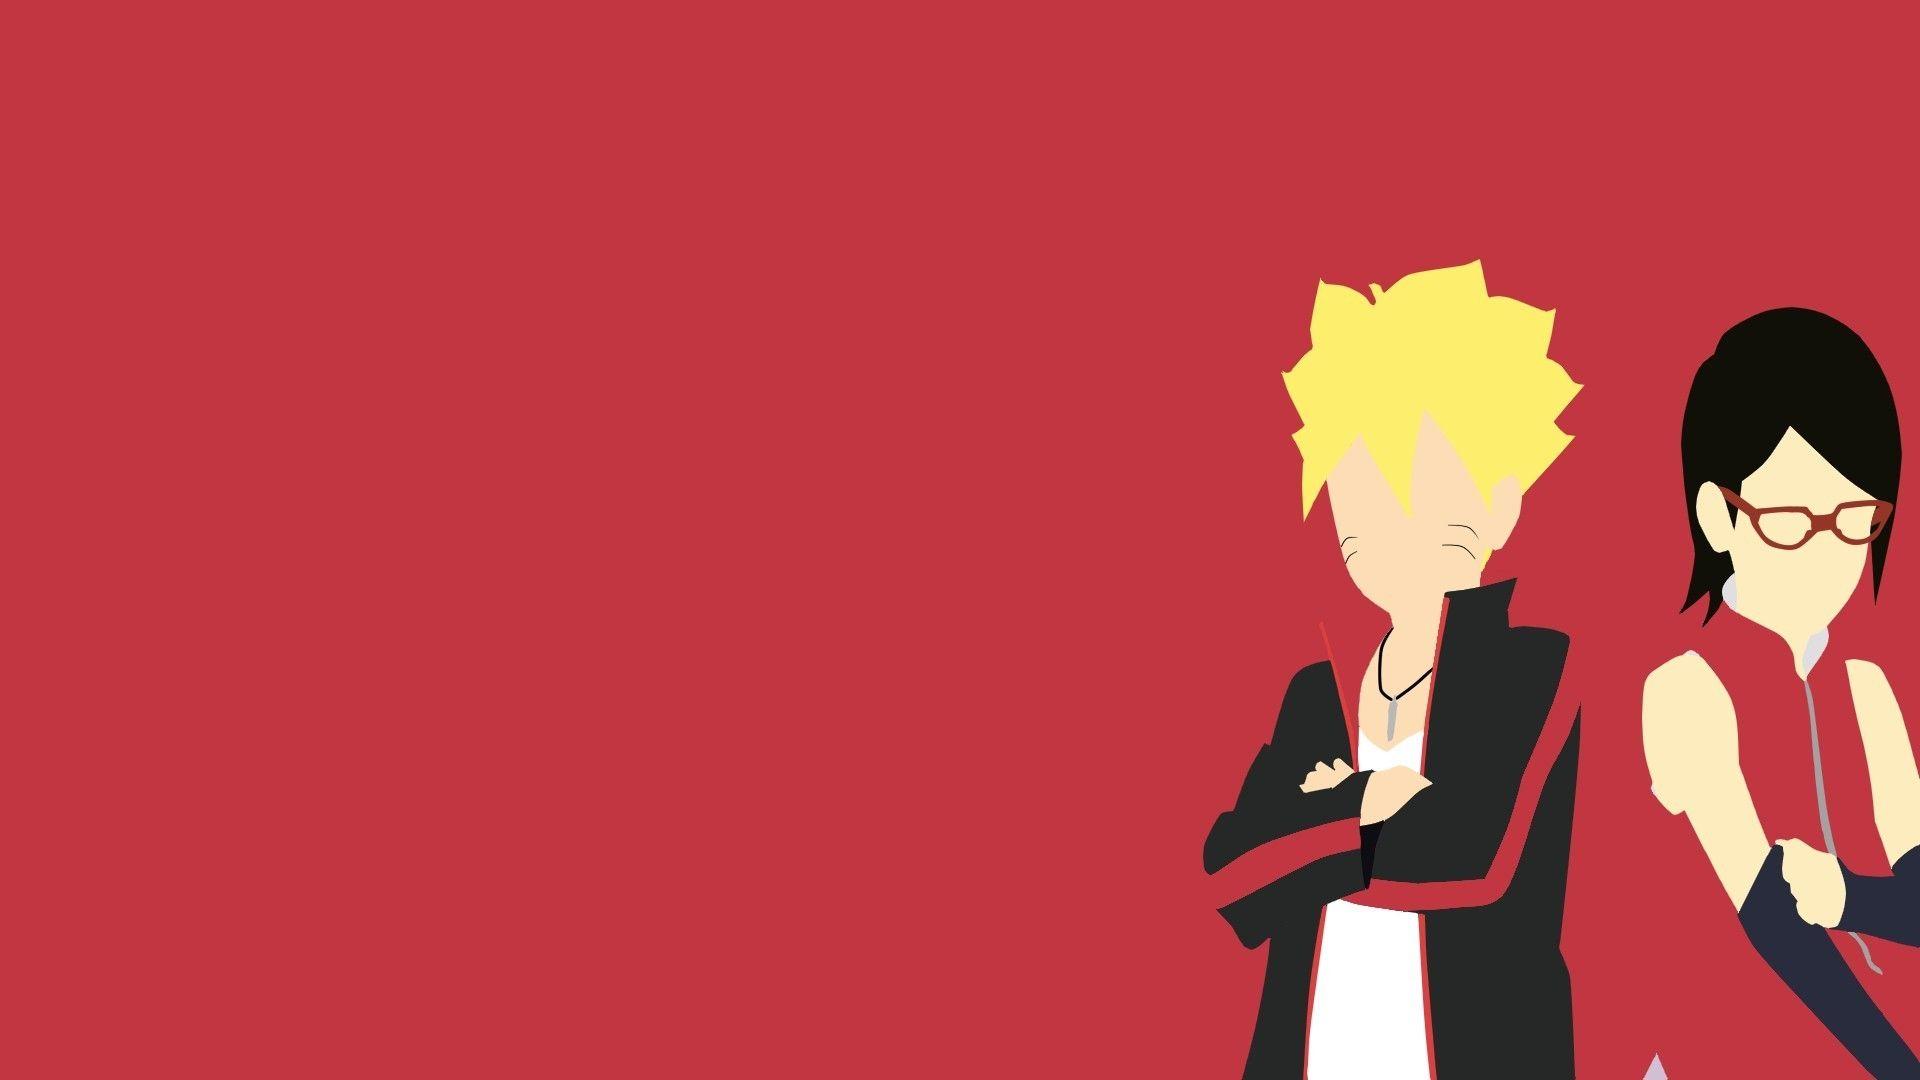 Naruto Minimalist, Wallpaper Image